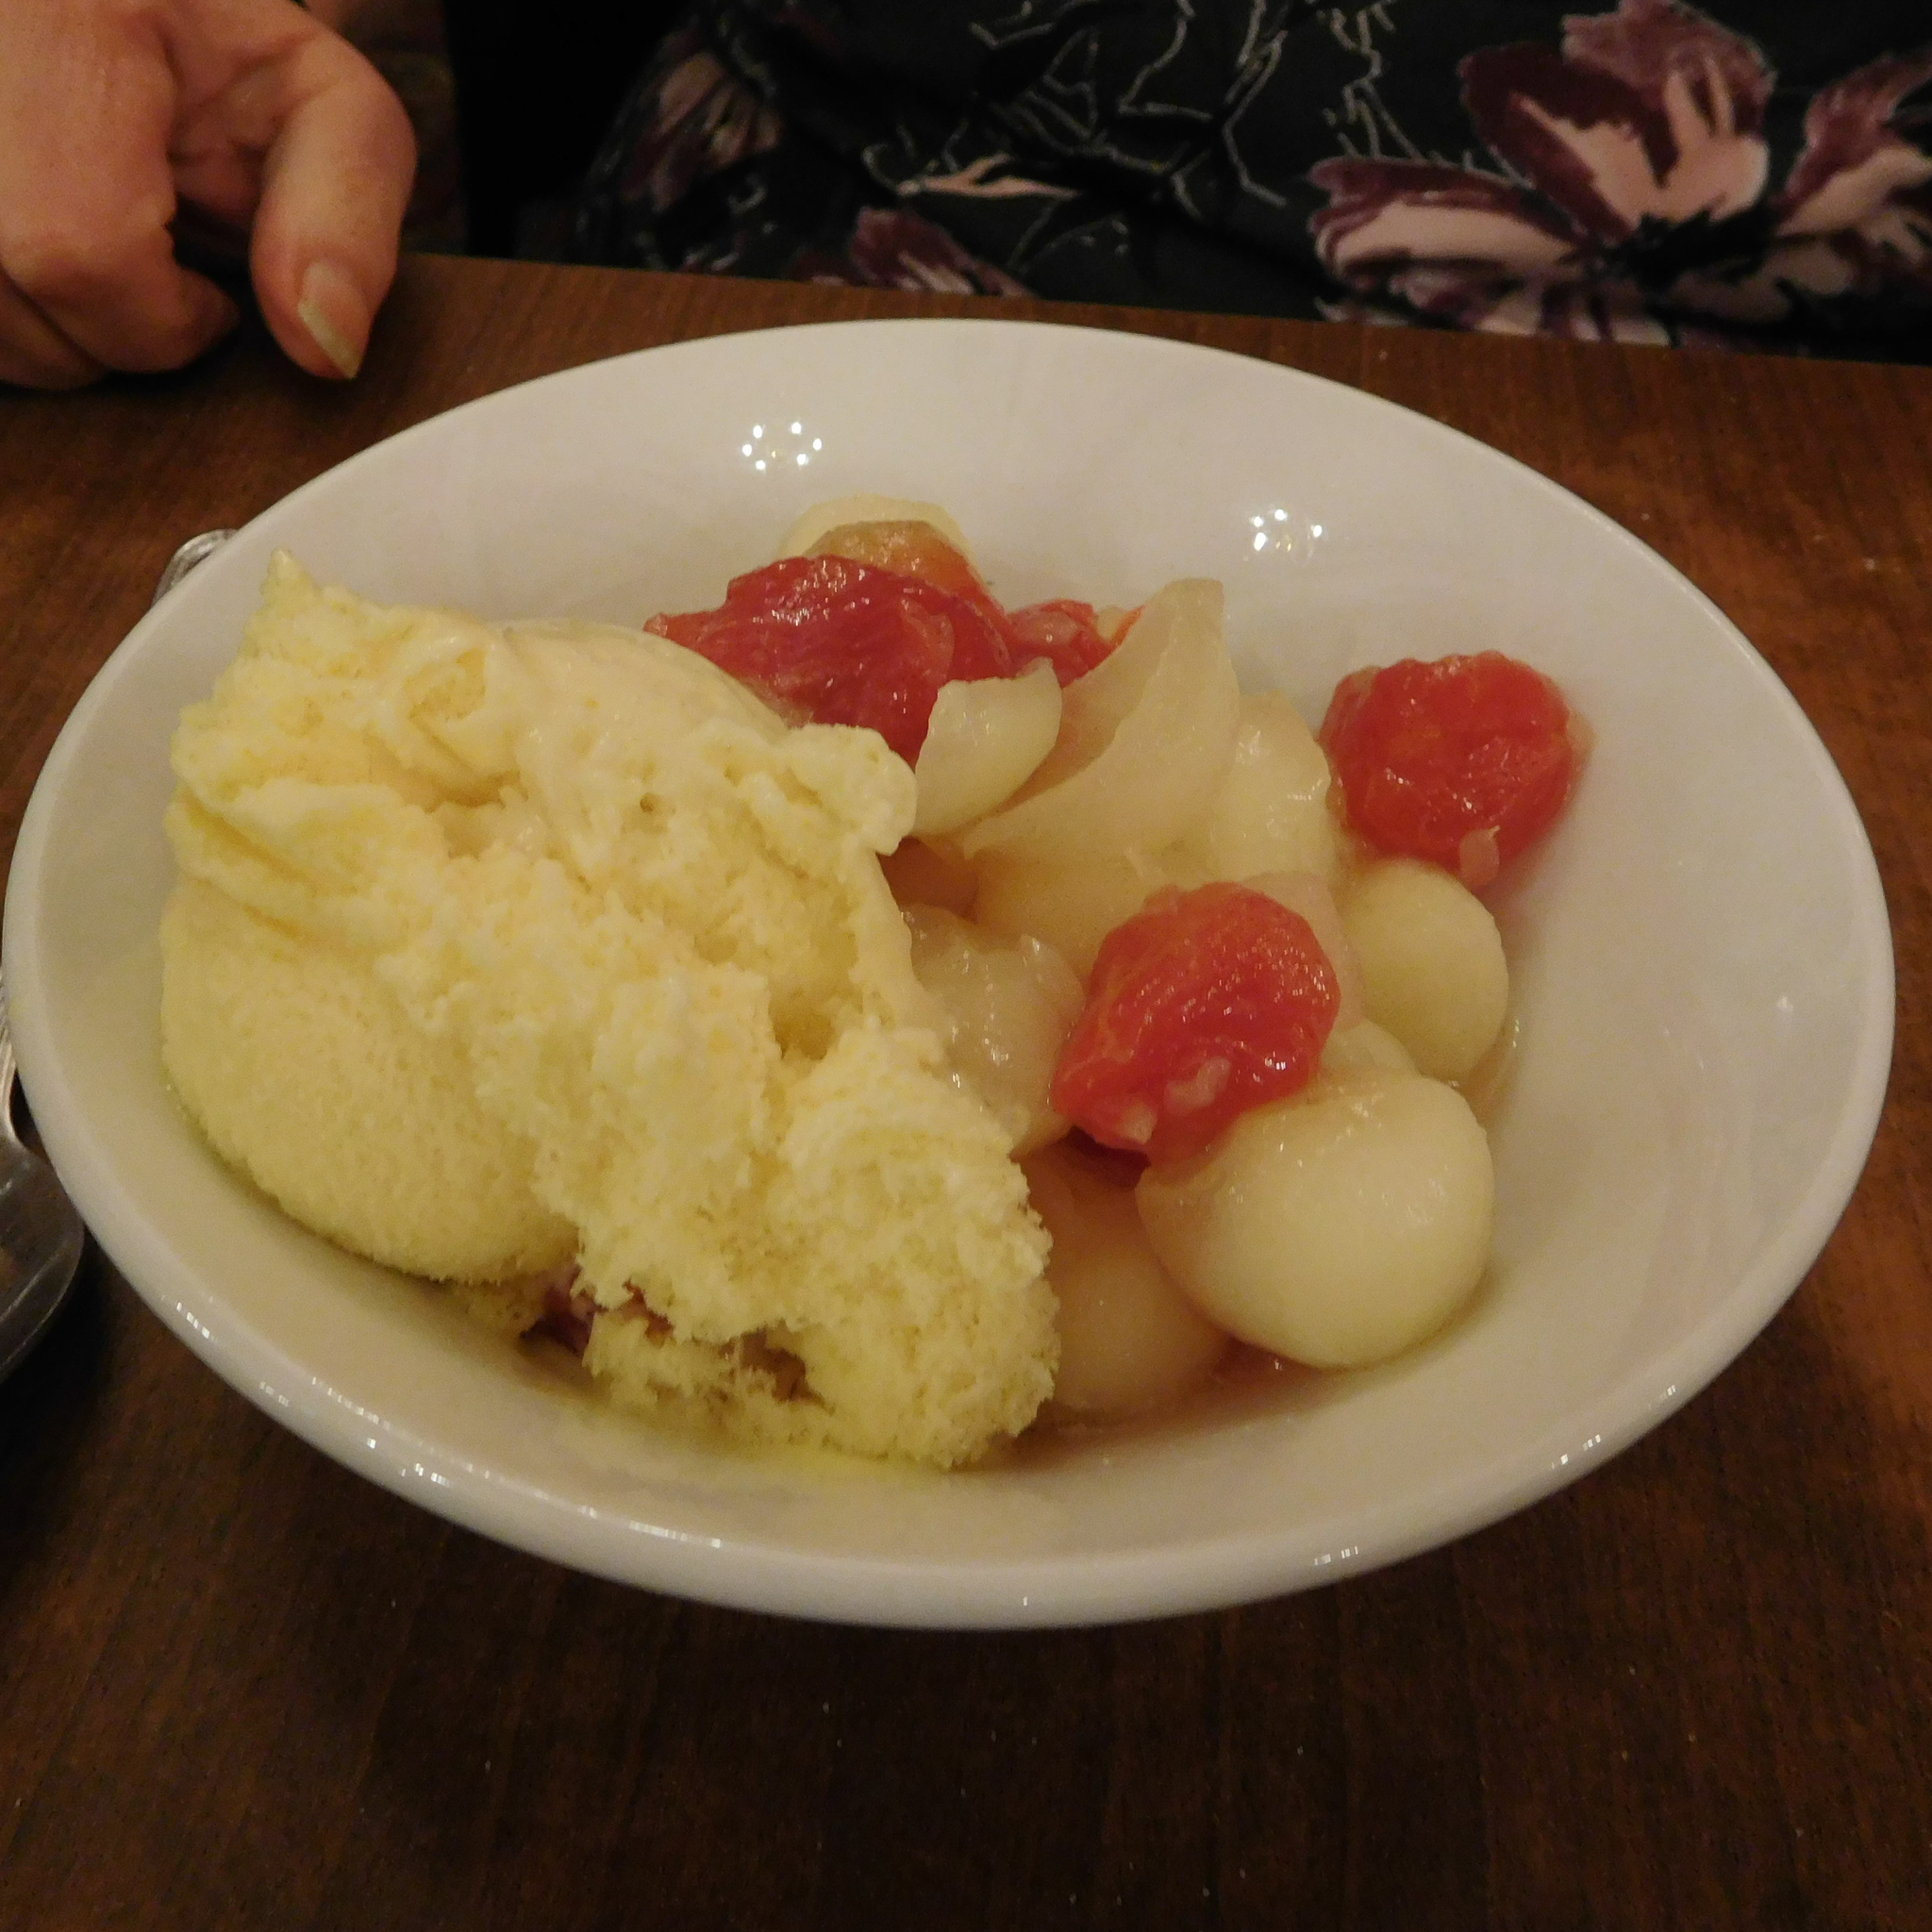 2017/02/11 Dinner at Grand Metropole